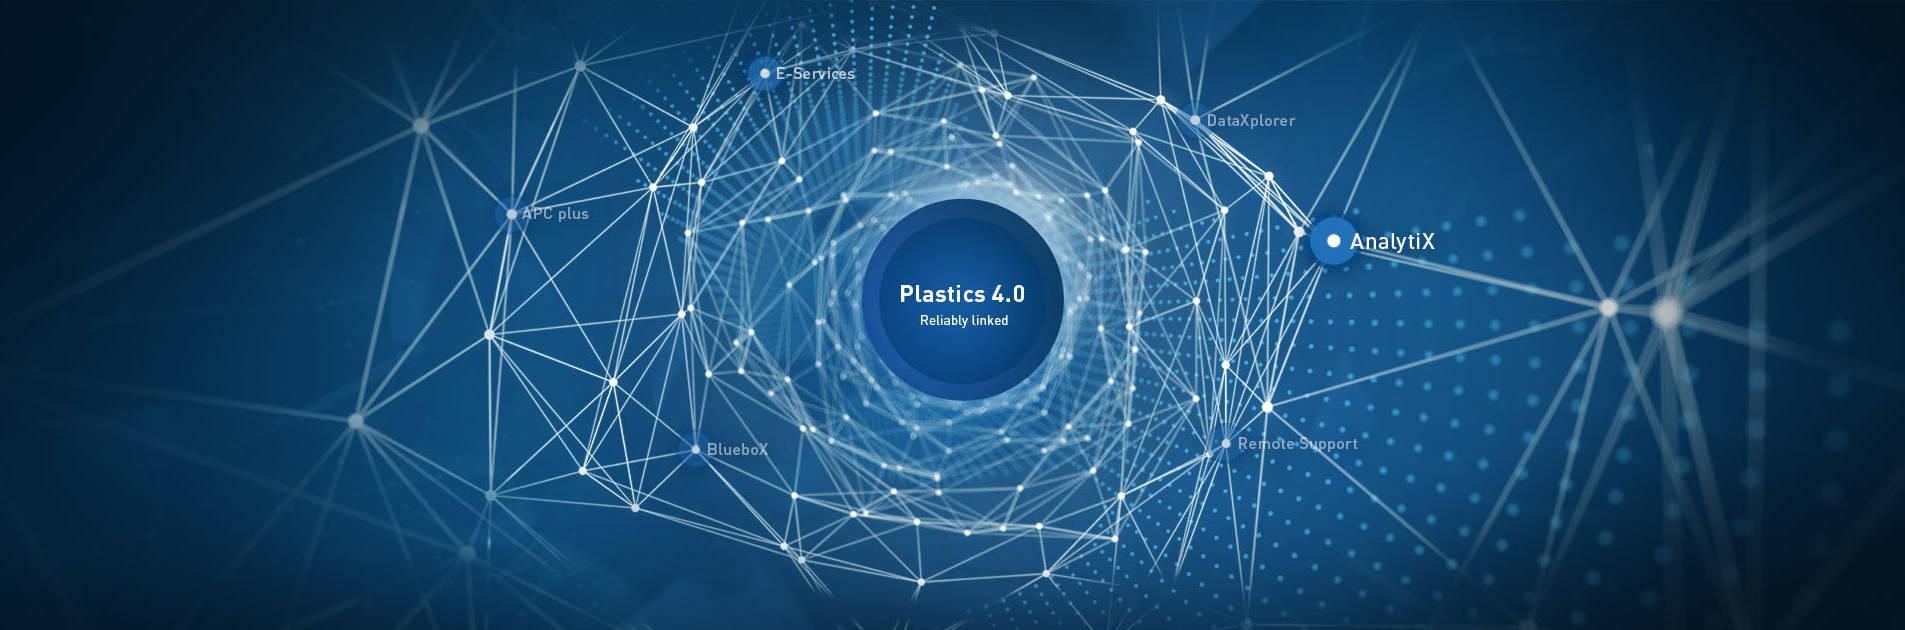 Plastics 4.0: AnalytiX goes live